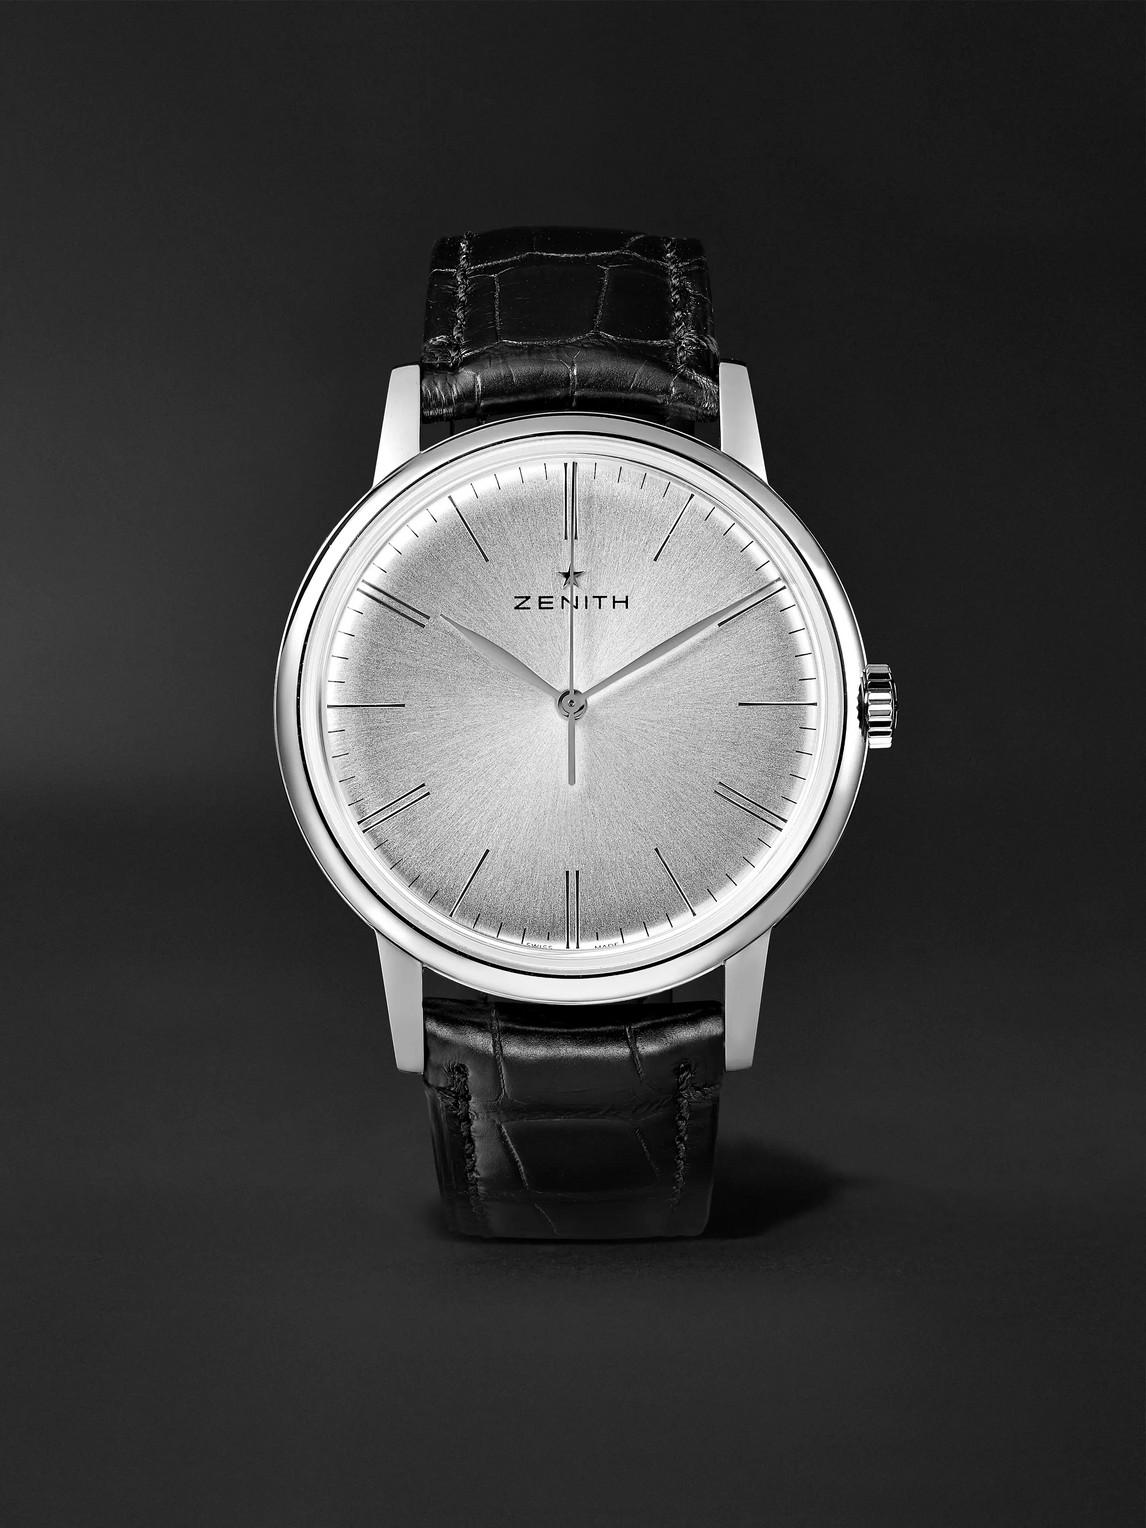 Zenith Elite 6150 42mm Stainless Steel And Alligator Watch, Ref. No. 03.2270.6150/01.c493 In Silver